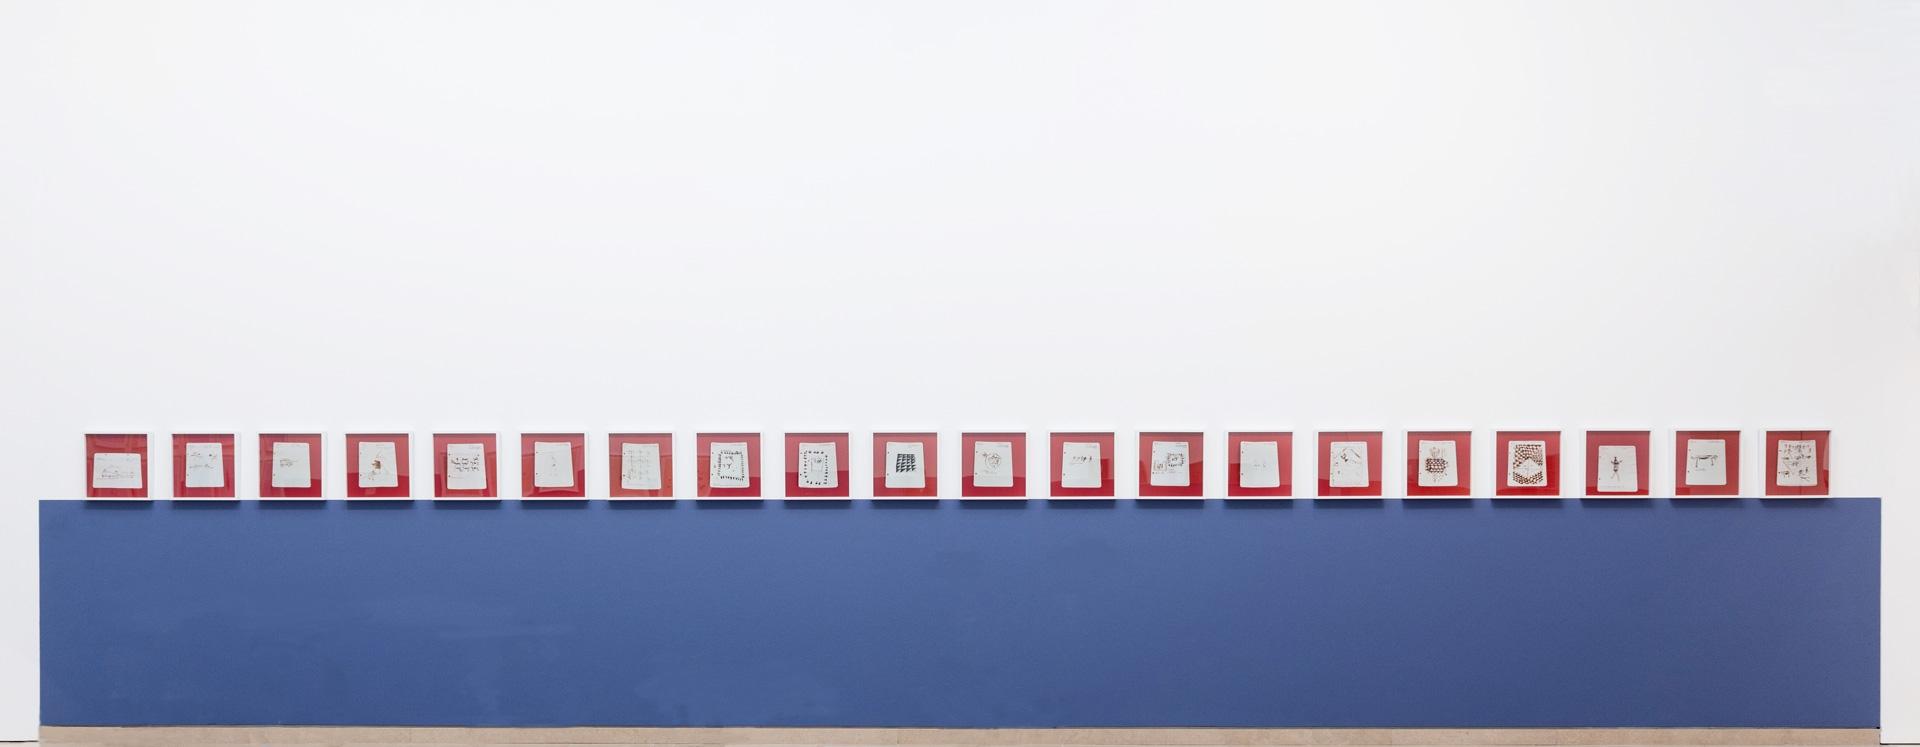 Untitled (Album de dessins indigènes series (album of North African drawings)), 2014-2015, chromogenic print, 40 x 40 cm each. Installation view, Carré d'Art, Nîmes, 2015